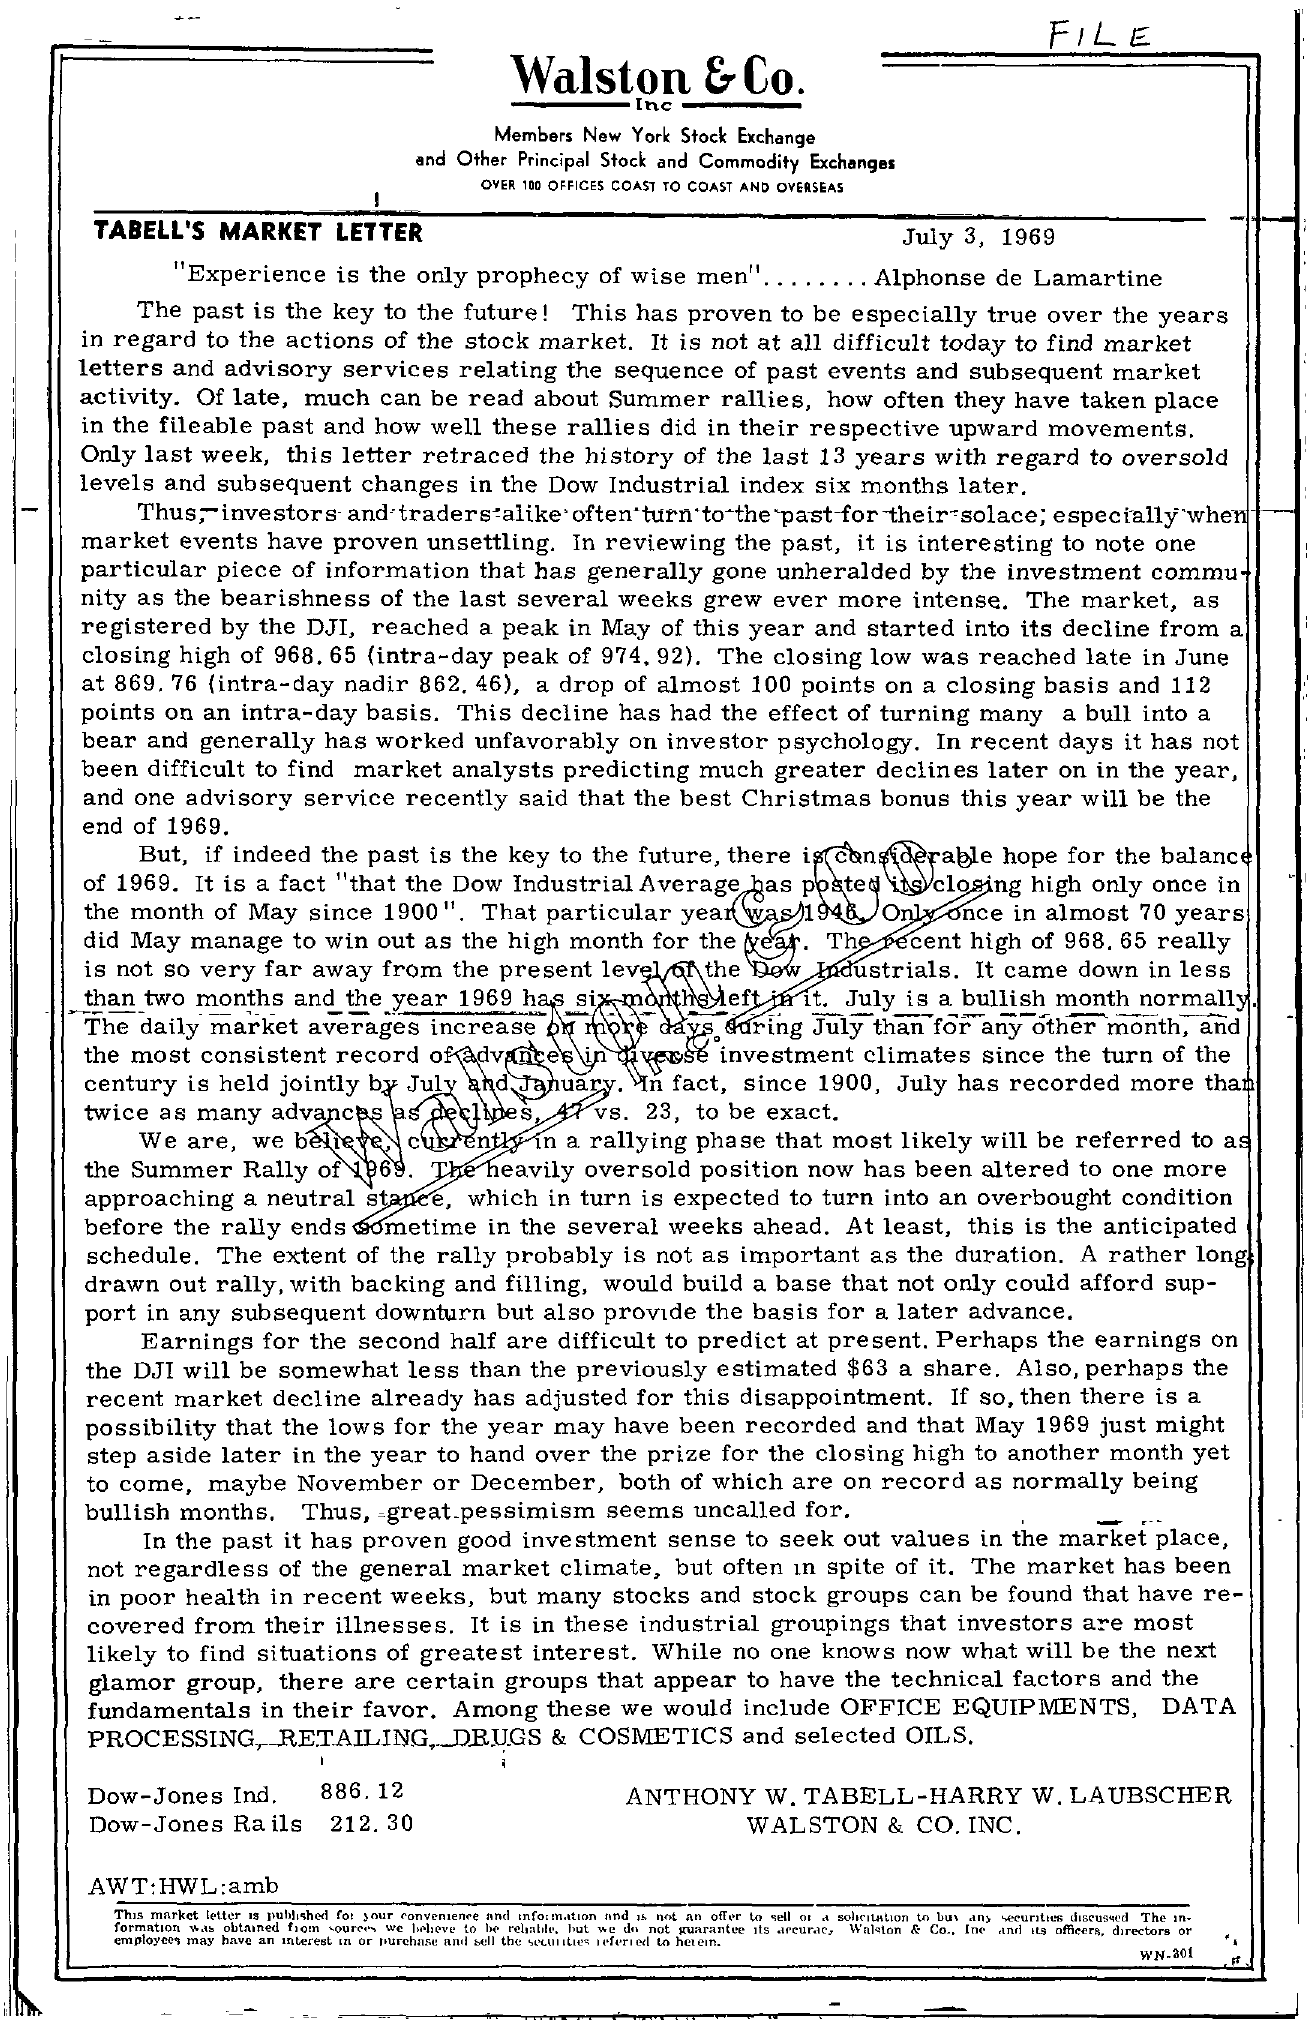 Tabell's Market Letter - July 03, 1969